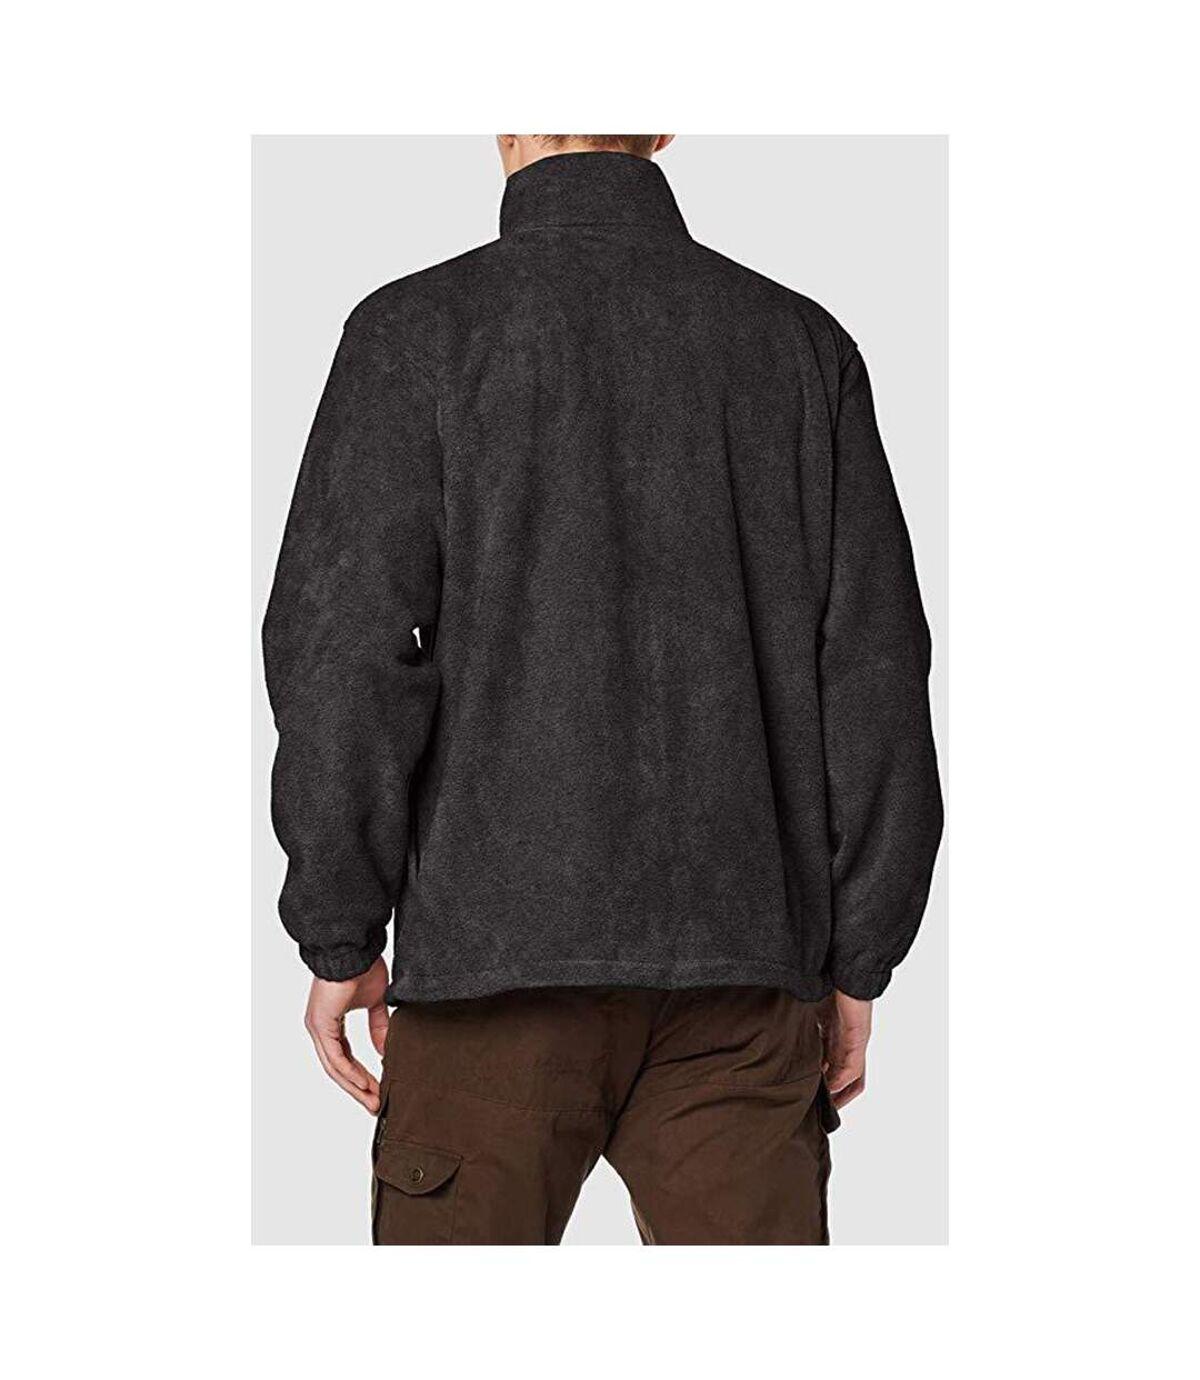 Result Mens Full Zip Active Fleece Anti Pilling Jacket (Black) - UTBC922